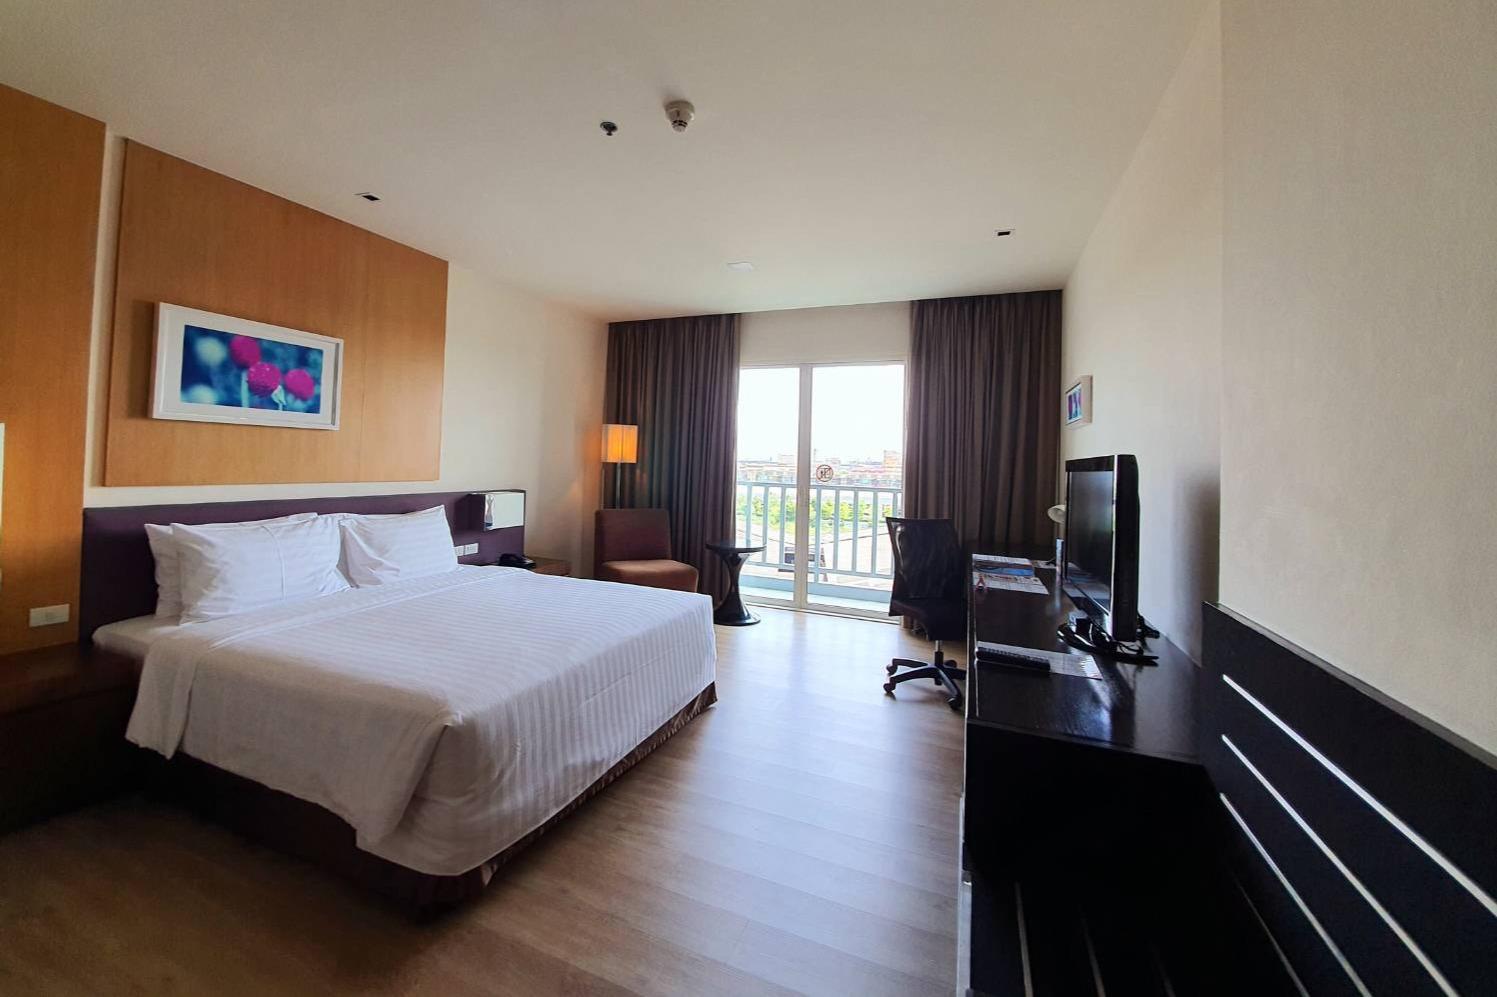 Amaranth Suvarnabhumi Hotel - Image 1